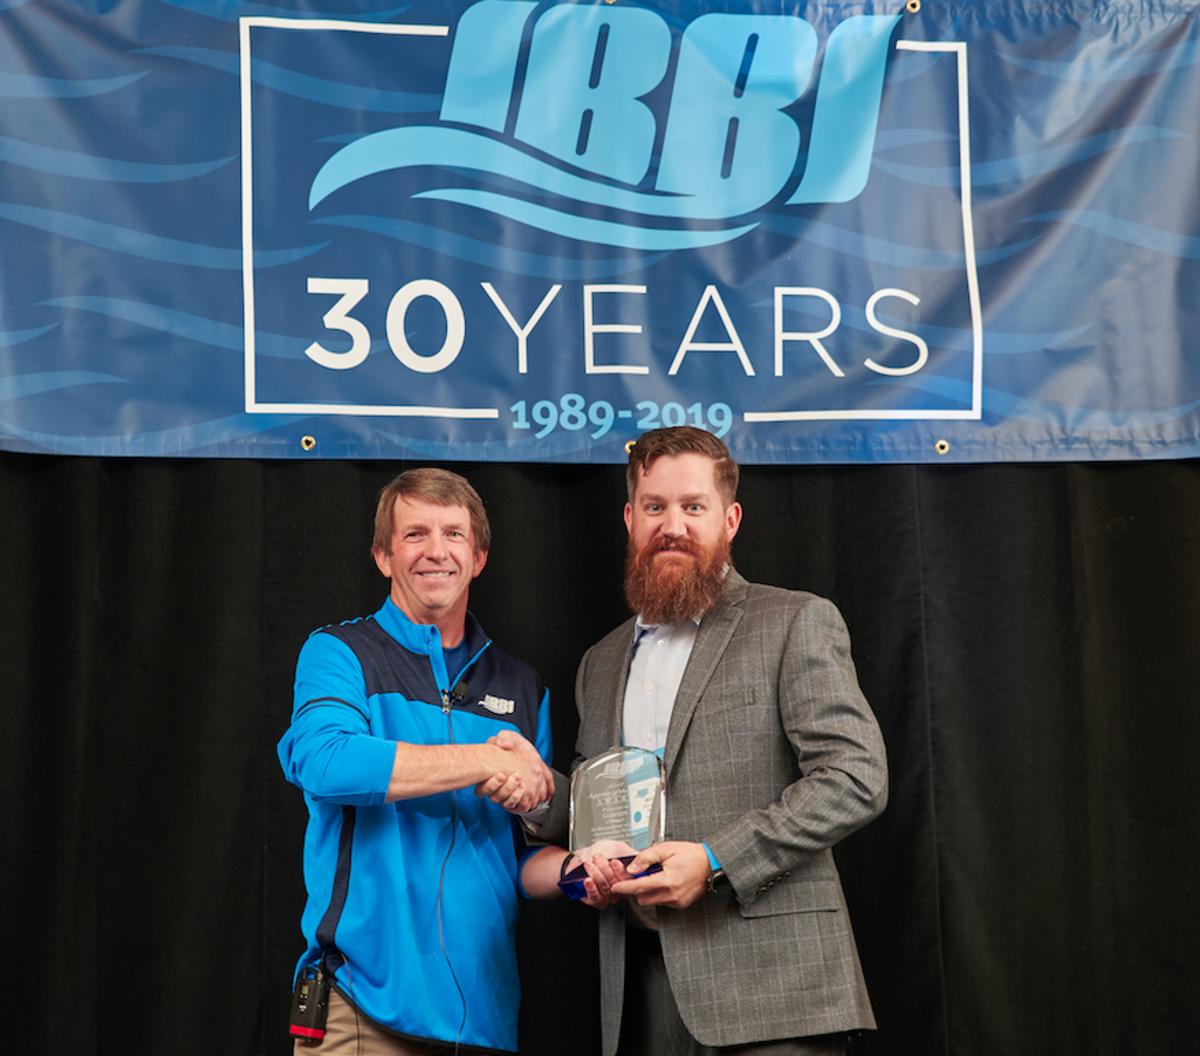 IBBI president Tom Broy (left) presents the award to Michael Range, Garmin's engineering business development manager for marine.